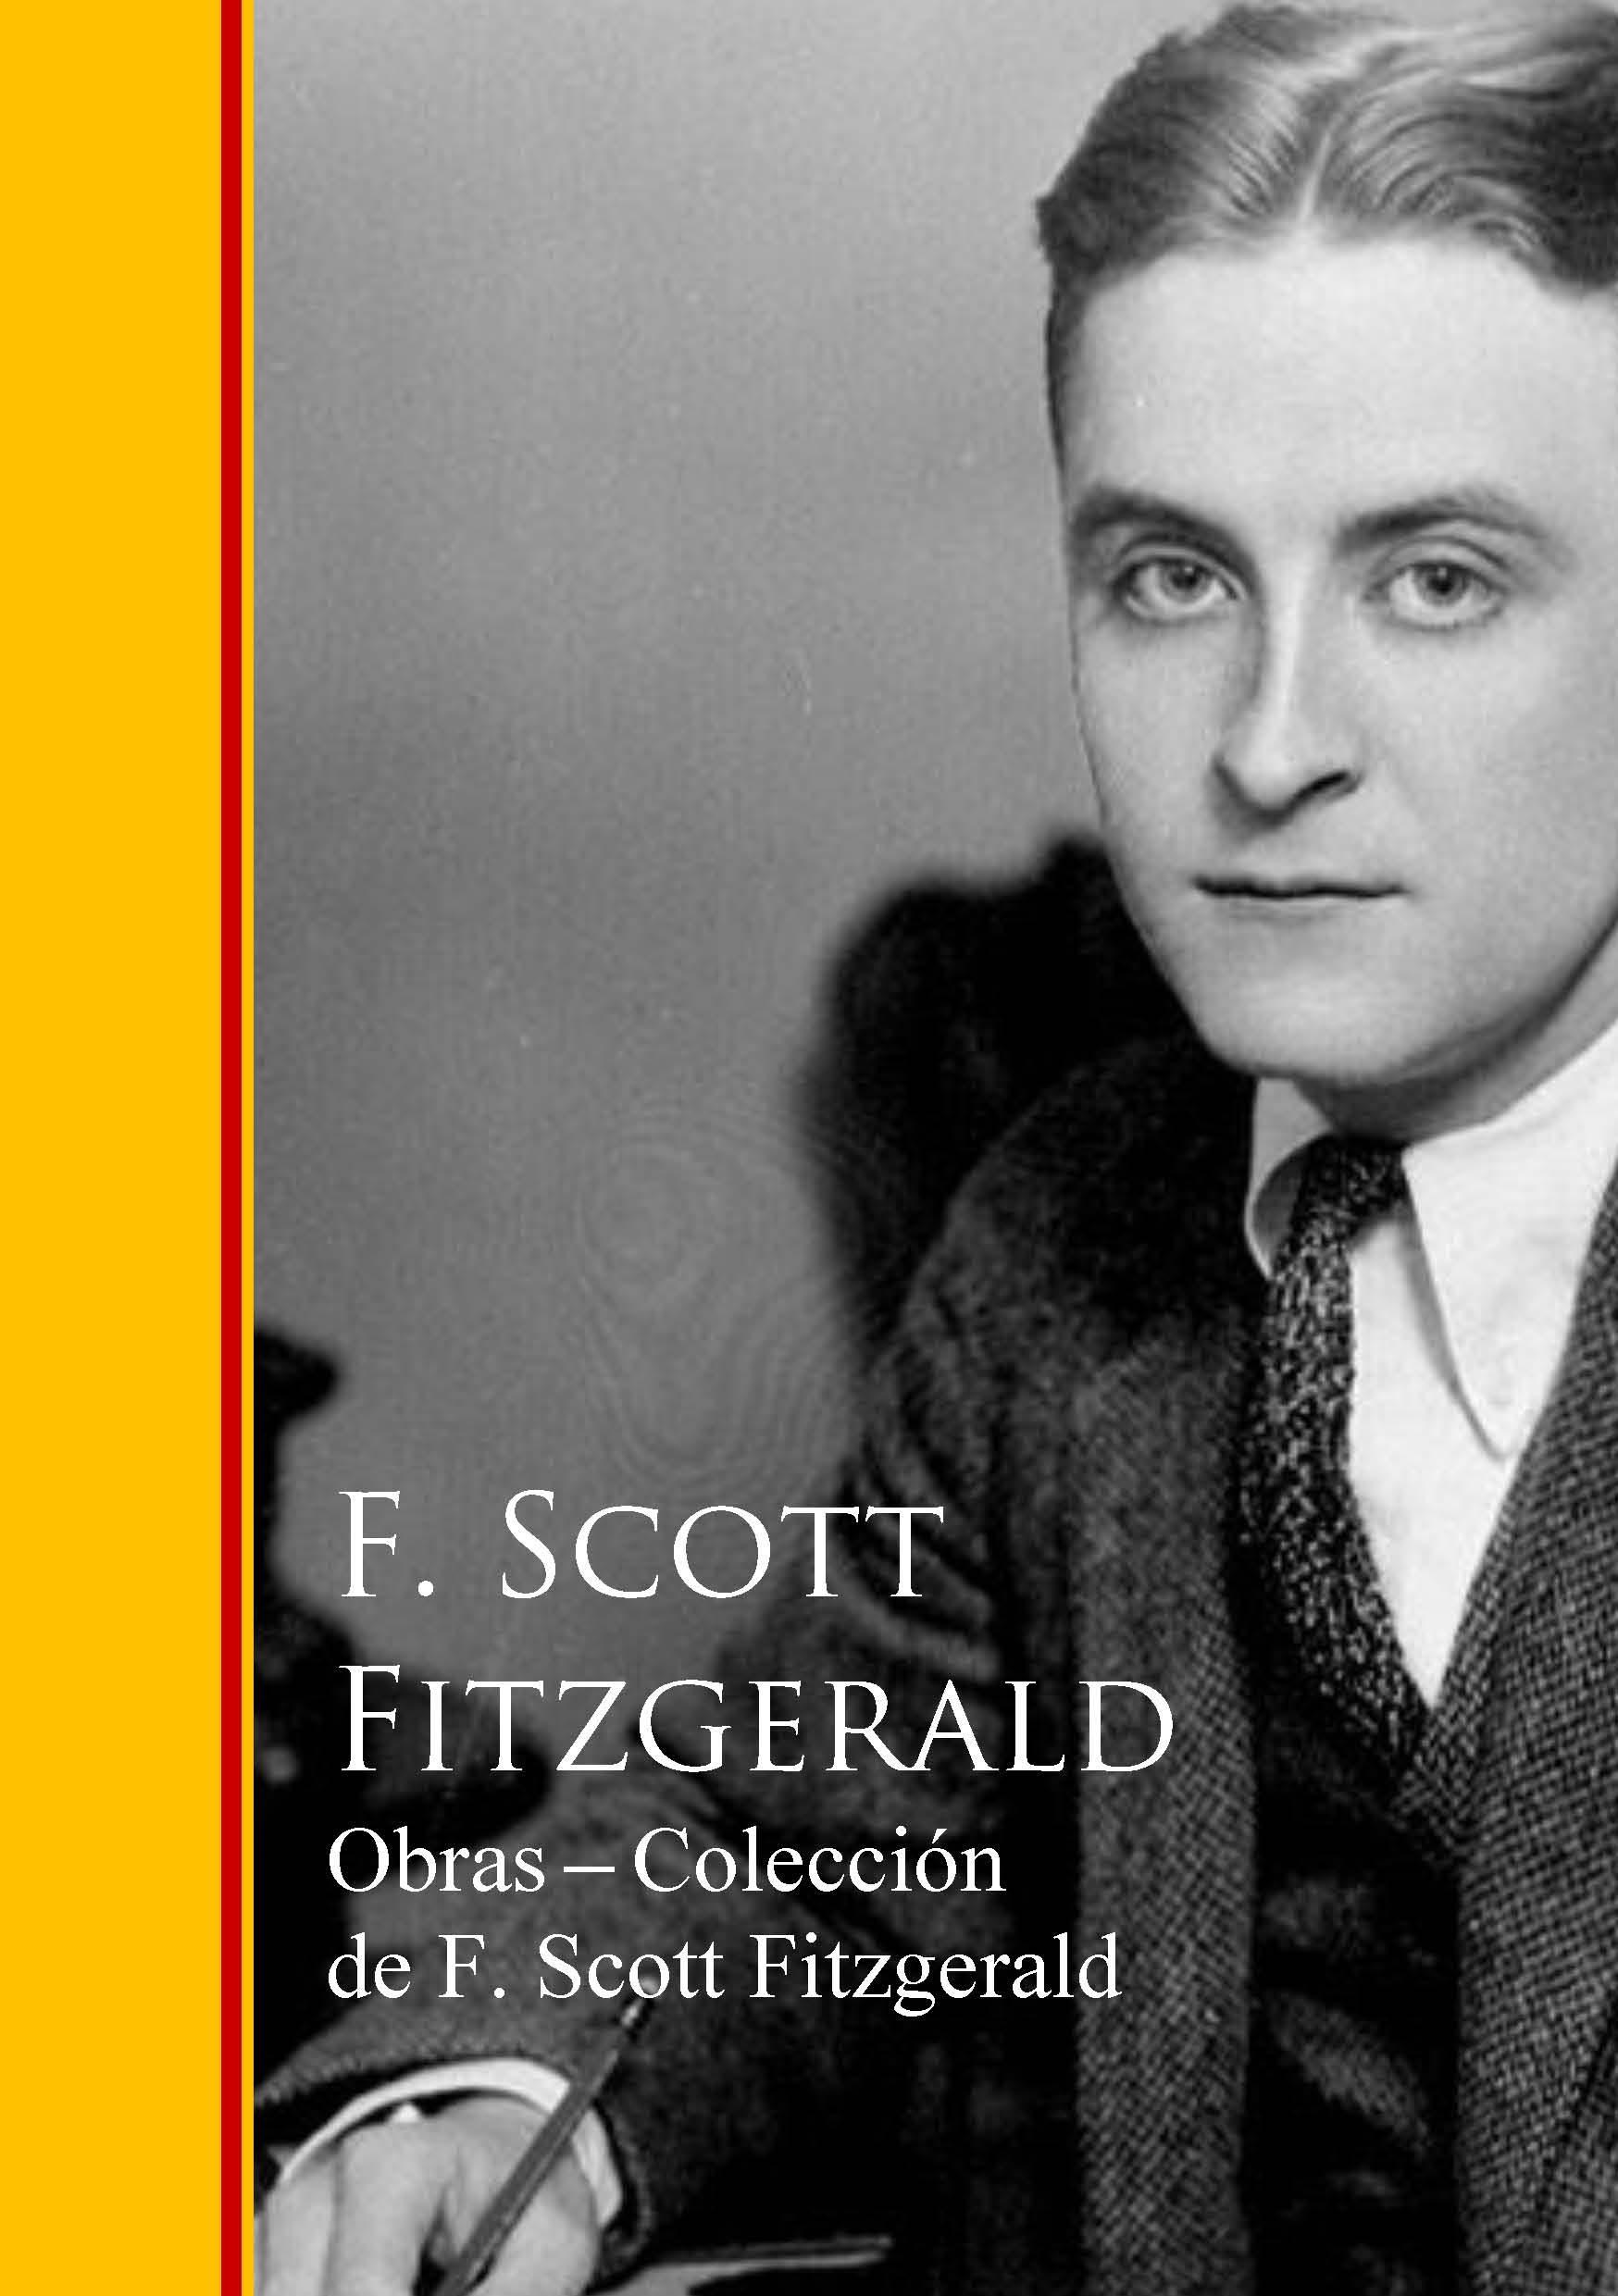 f. scott fitzgerald peliculas